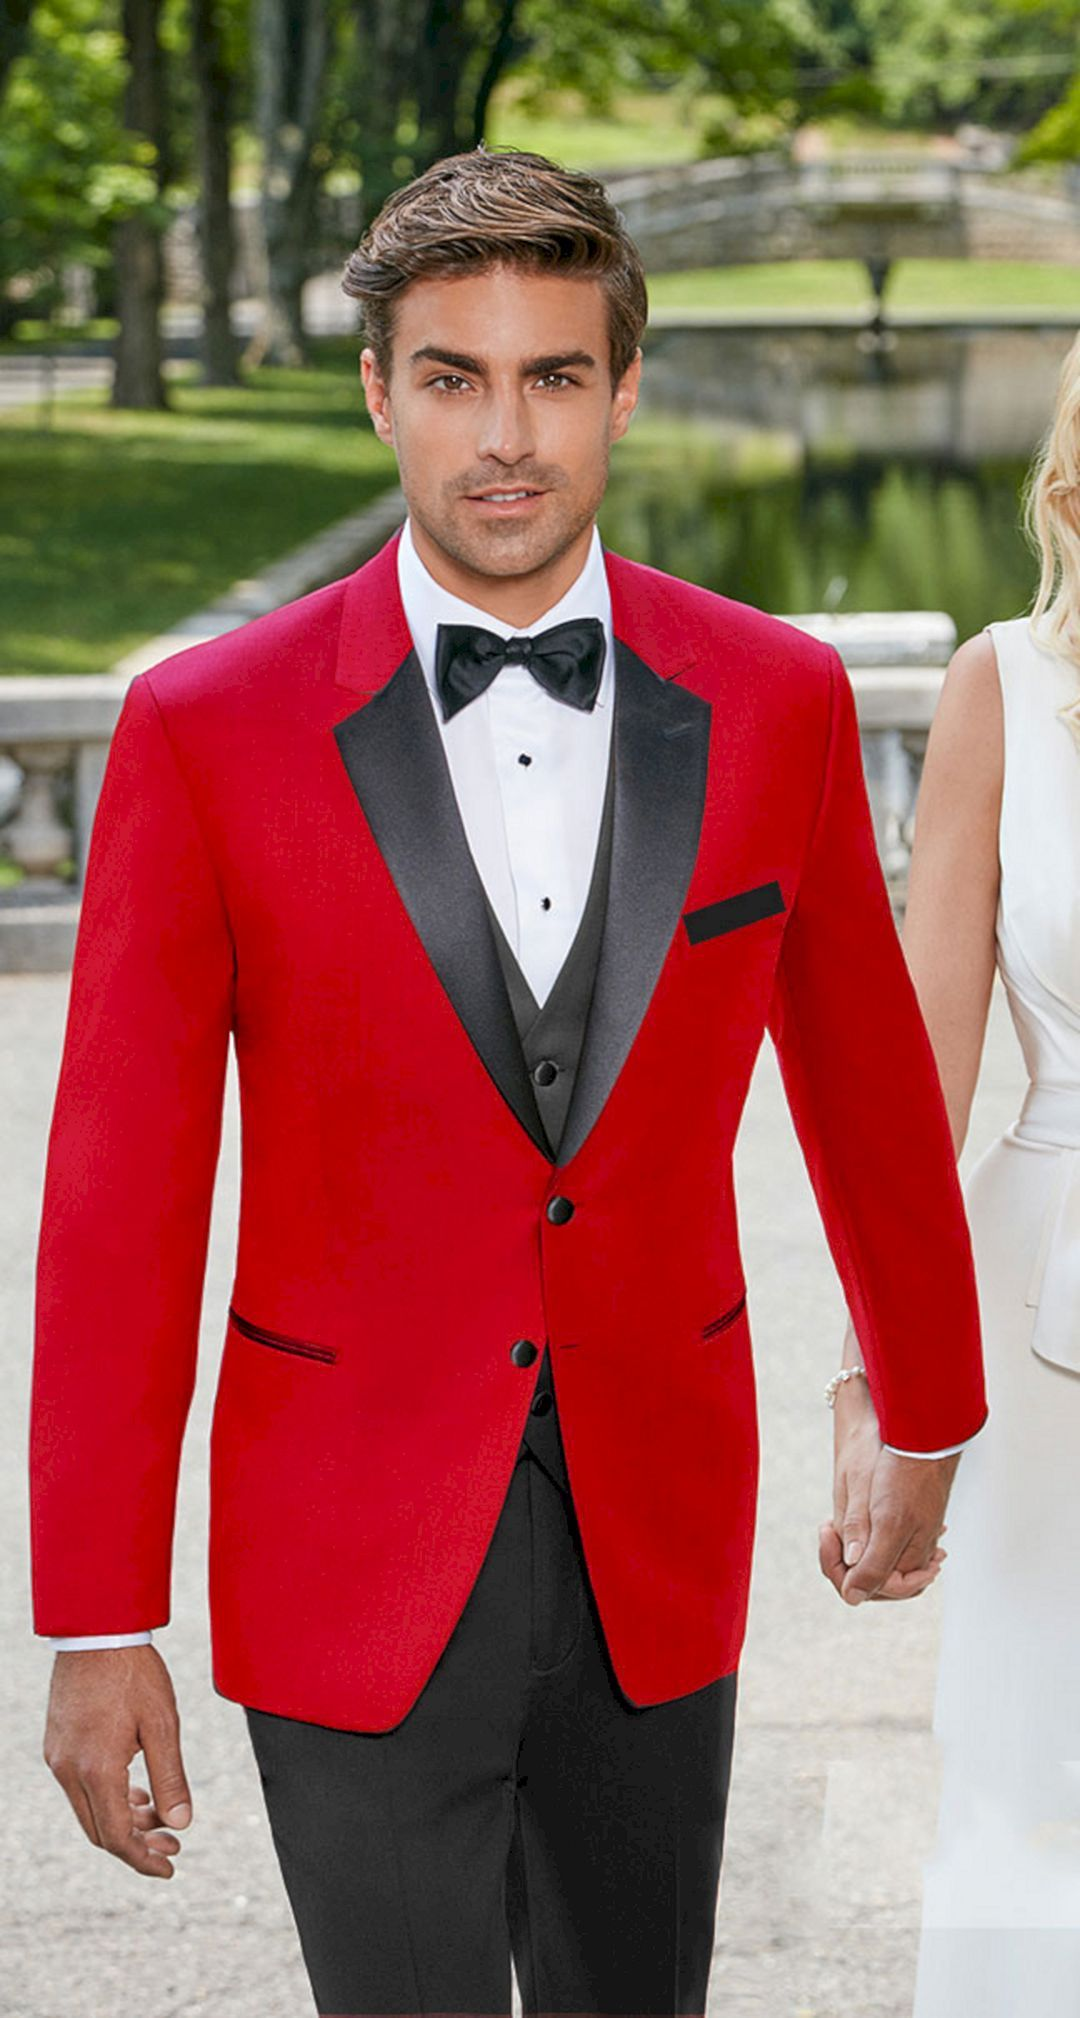 Red Black and White Wedding Tuxedo 116 Wedding suits men